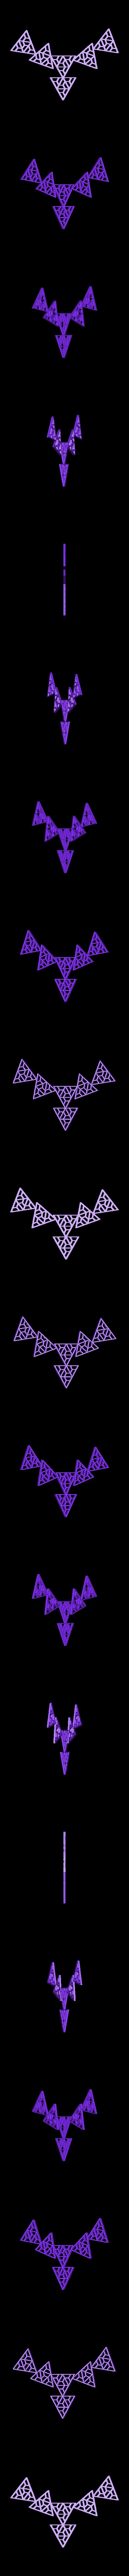 p144.stl Download free STL file Geometric necklace • 3D printer model, solunkejagruti